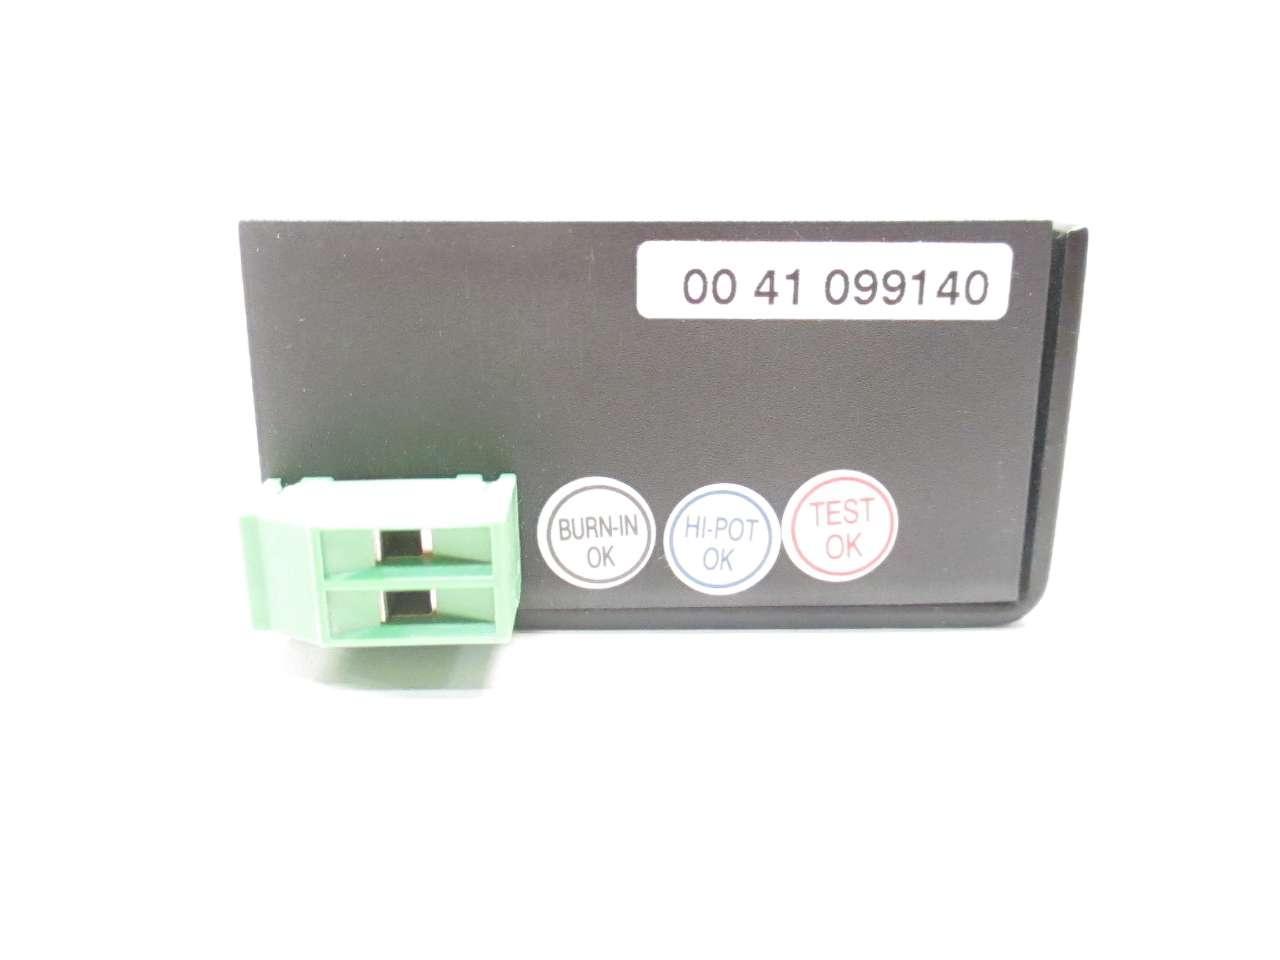 SOLA SCP30 S24B-DN Power Supply 100-240V-AC 1.3A 24V-DC